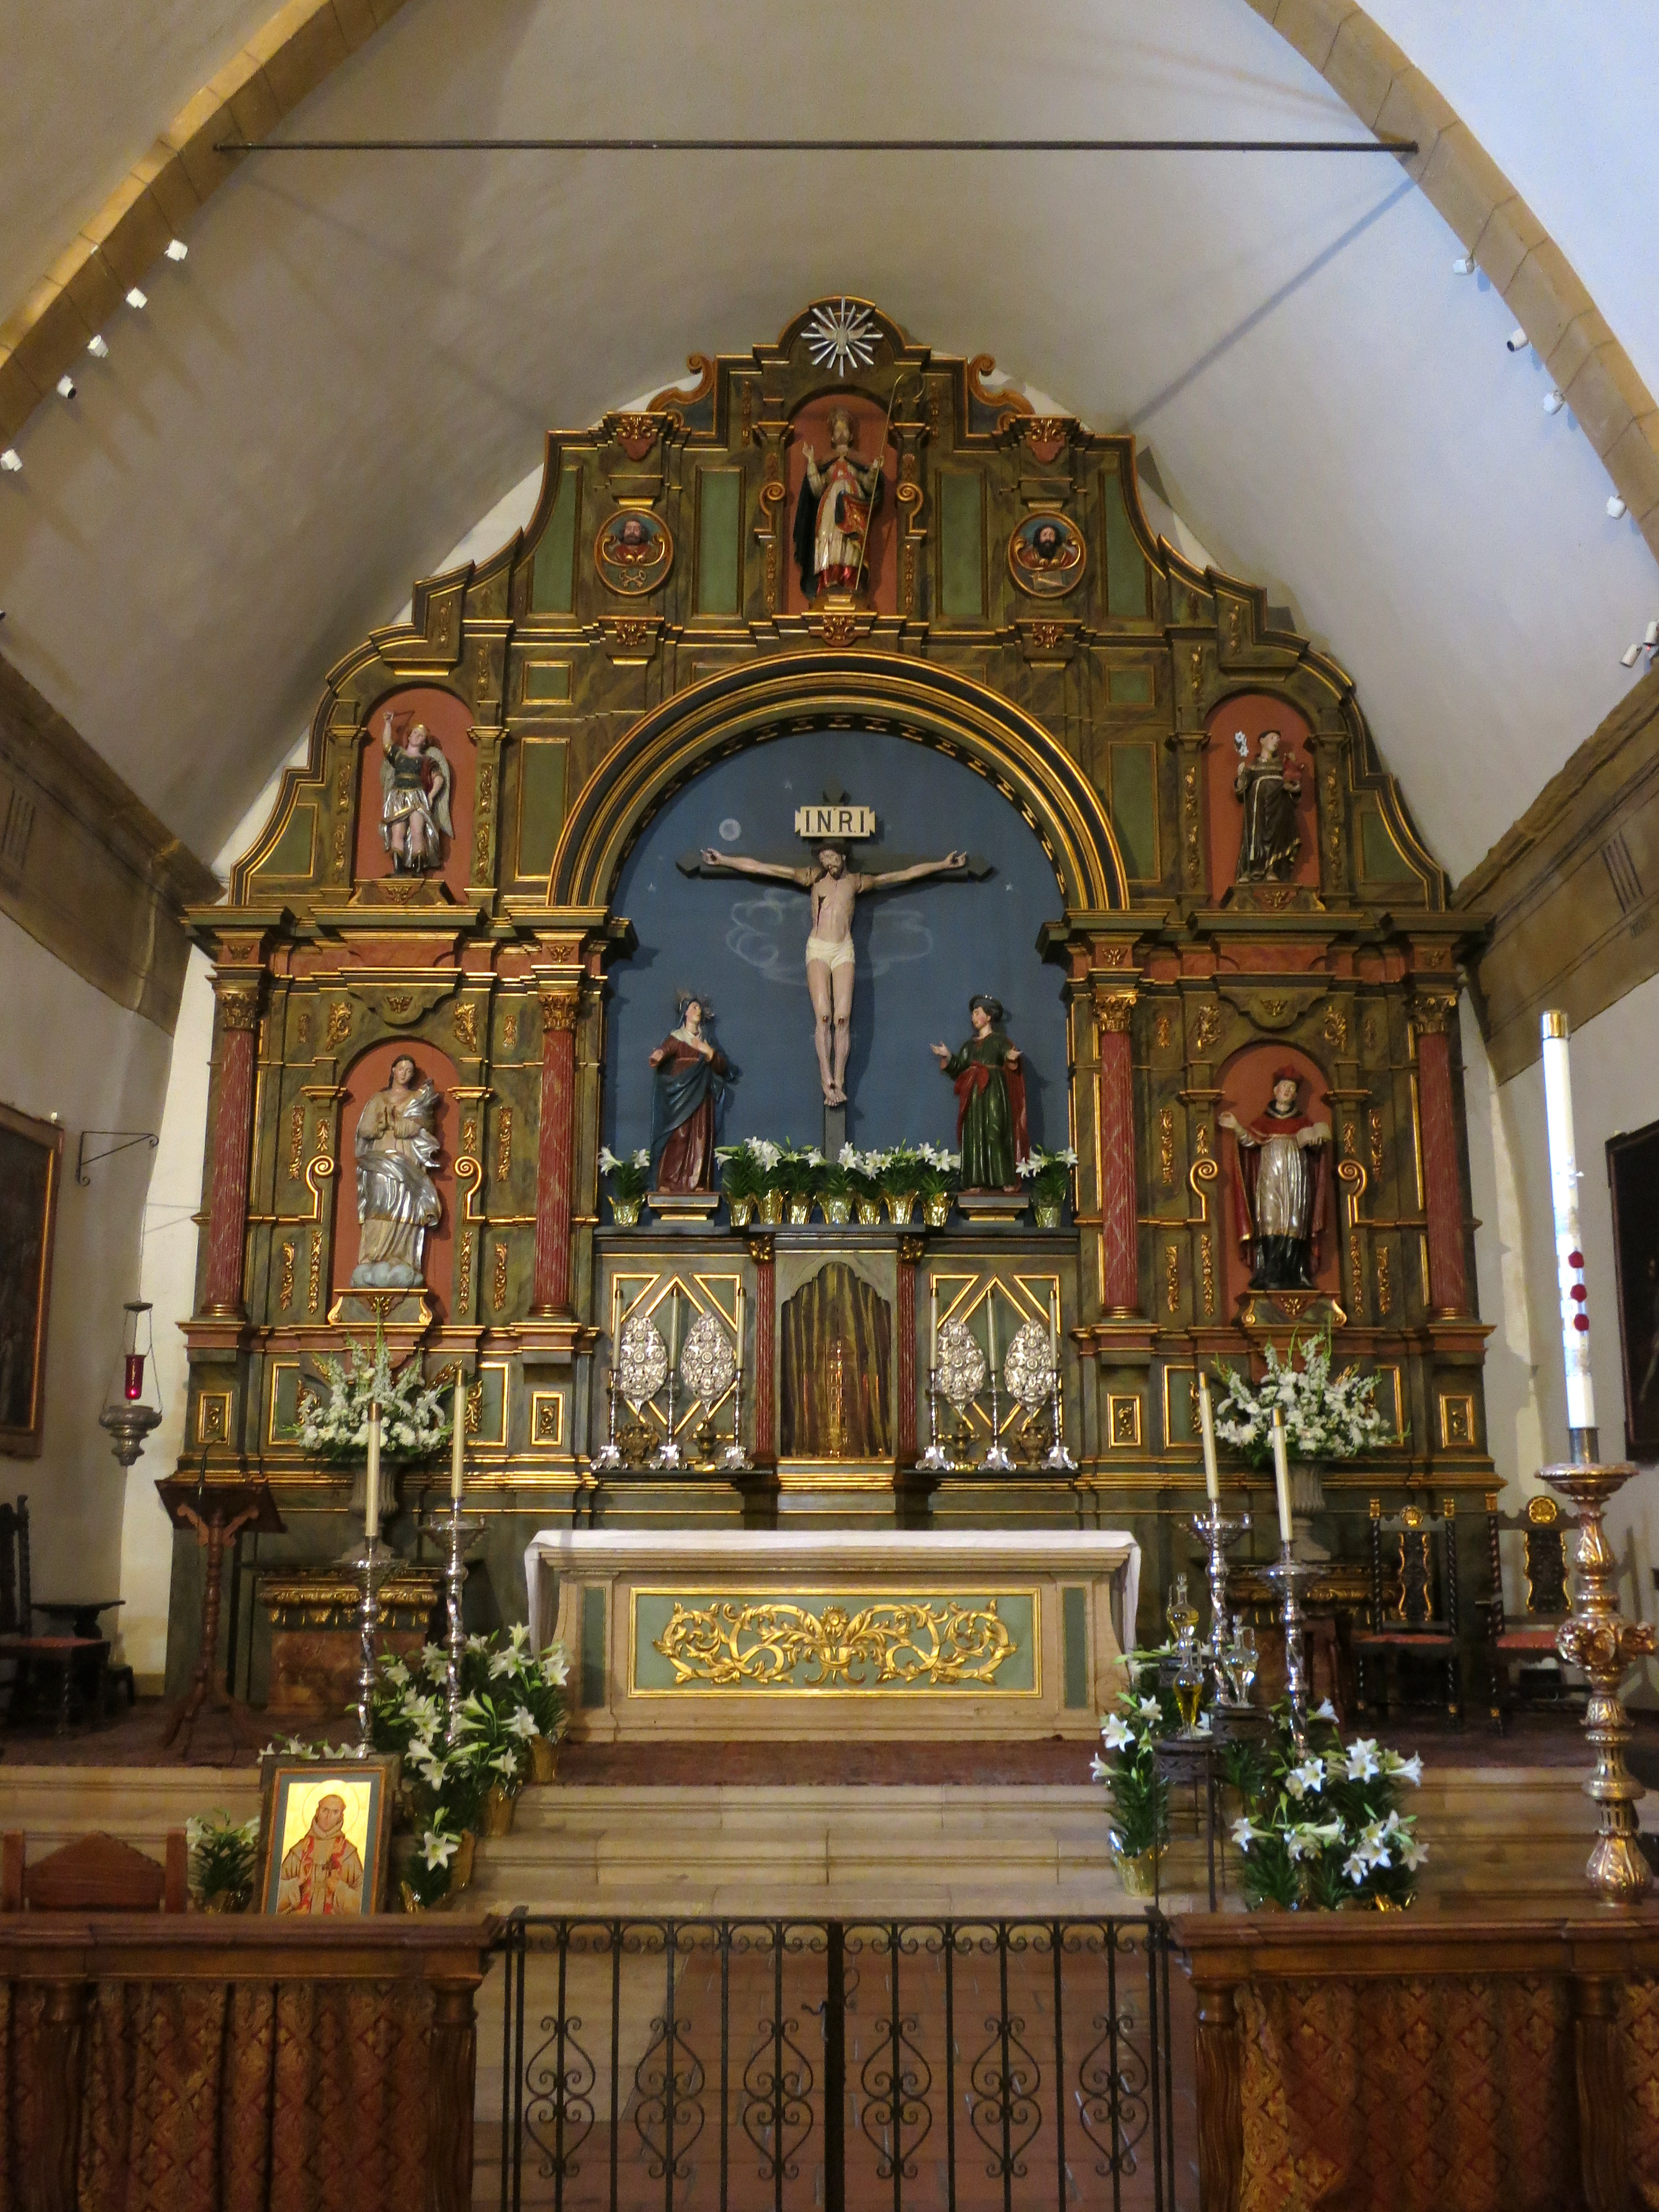 File:Mission San Carlos Borromeo de Carmelo (Carmel, CA) - basilica interior,  chancel decorated for Easter.jpg - Wikimedia Commons